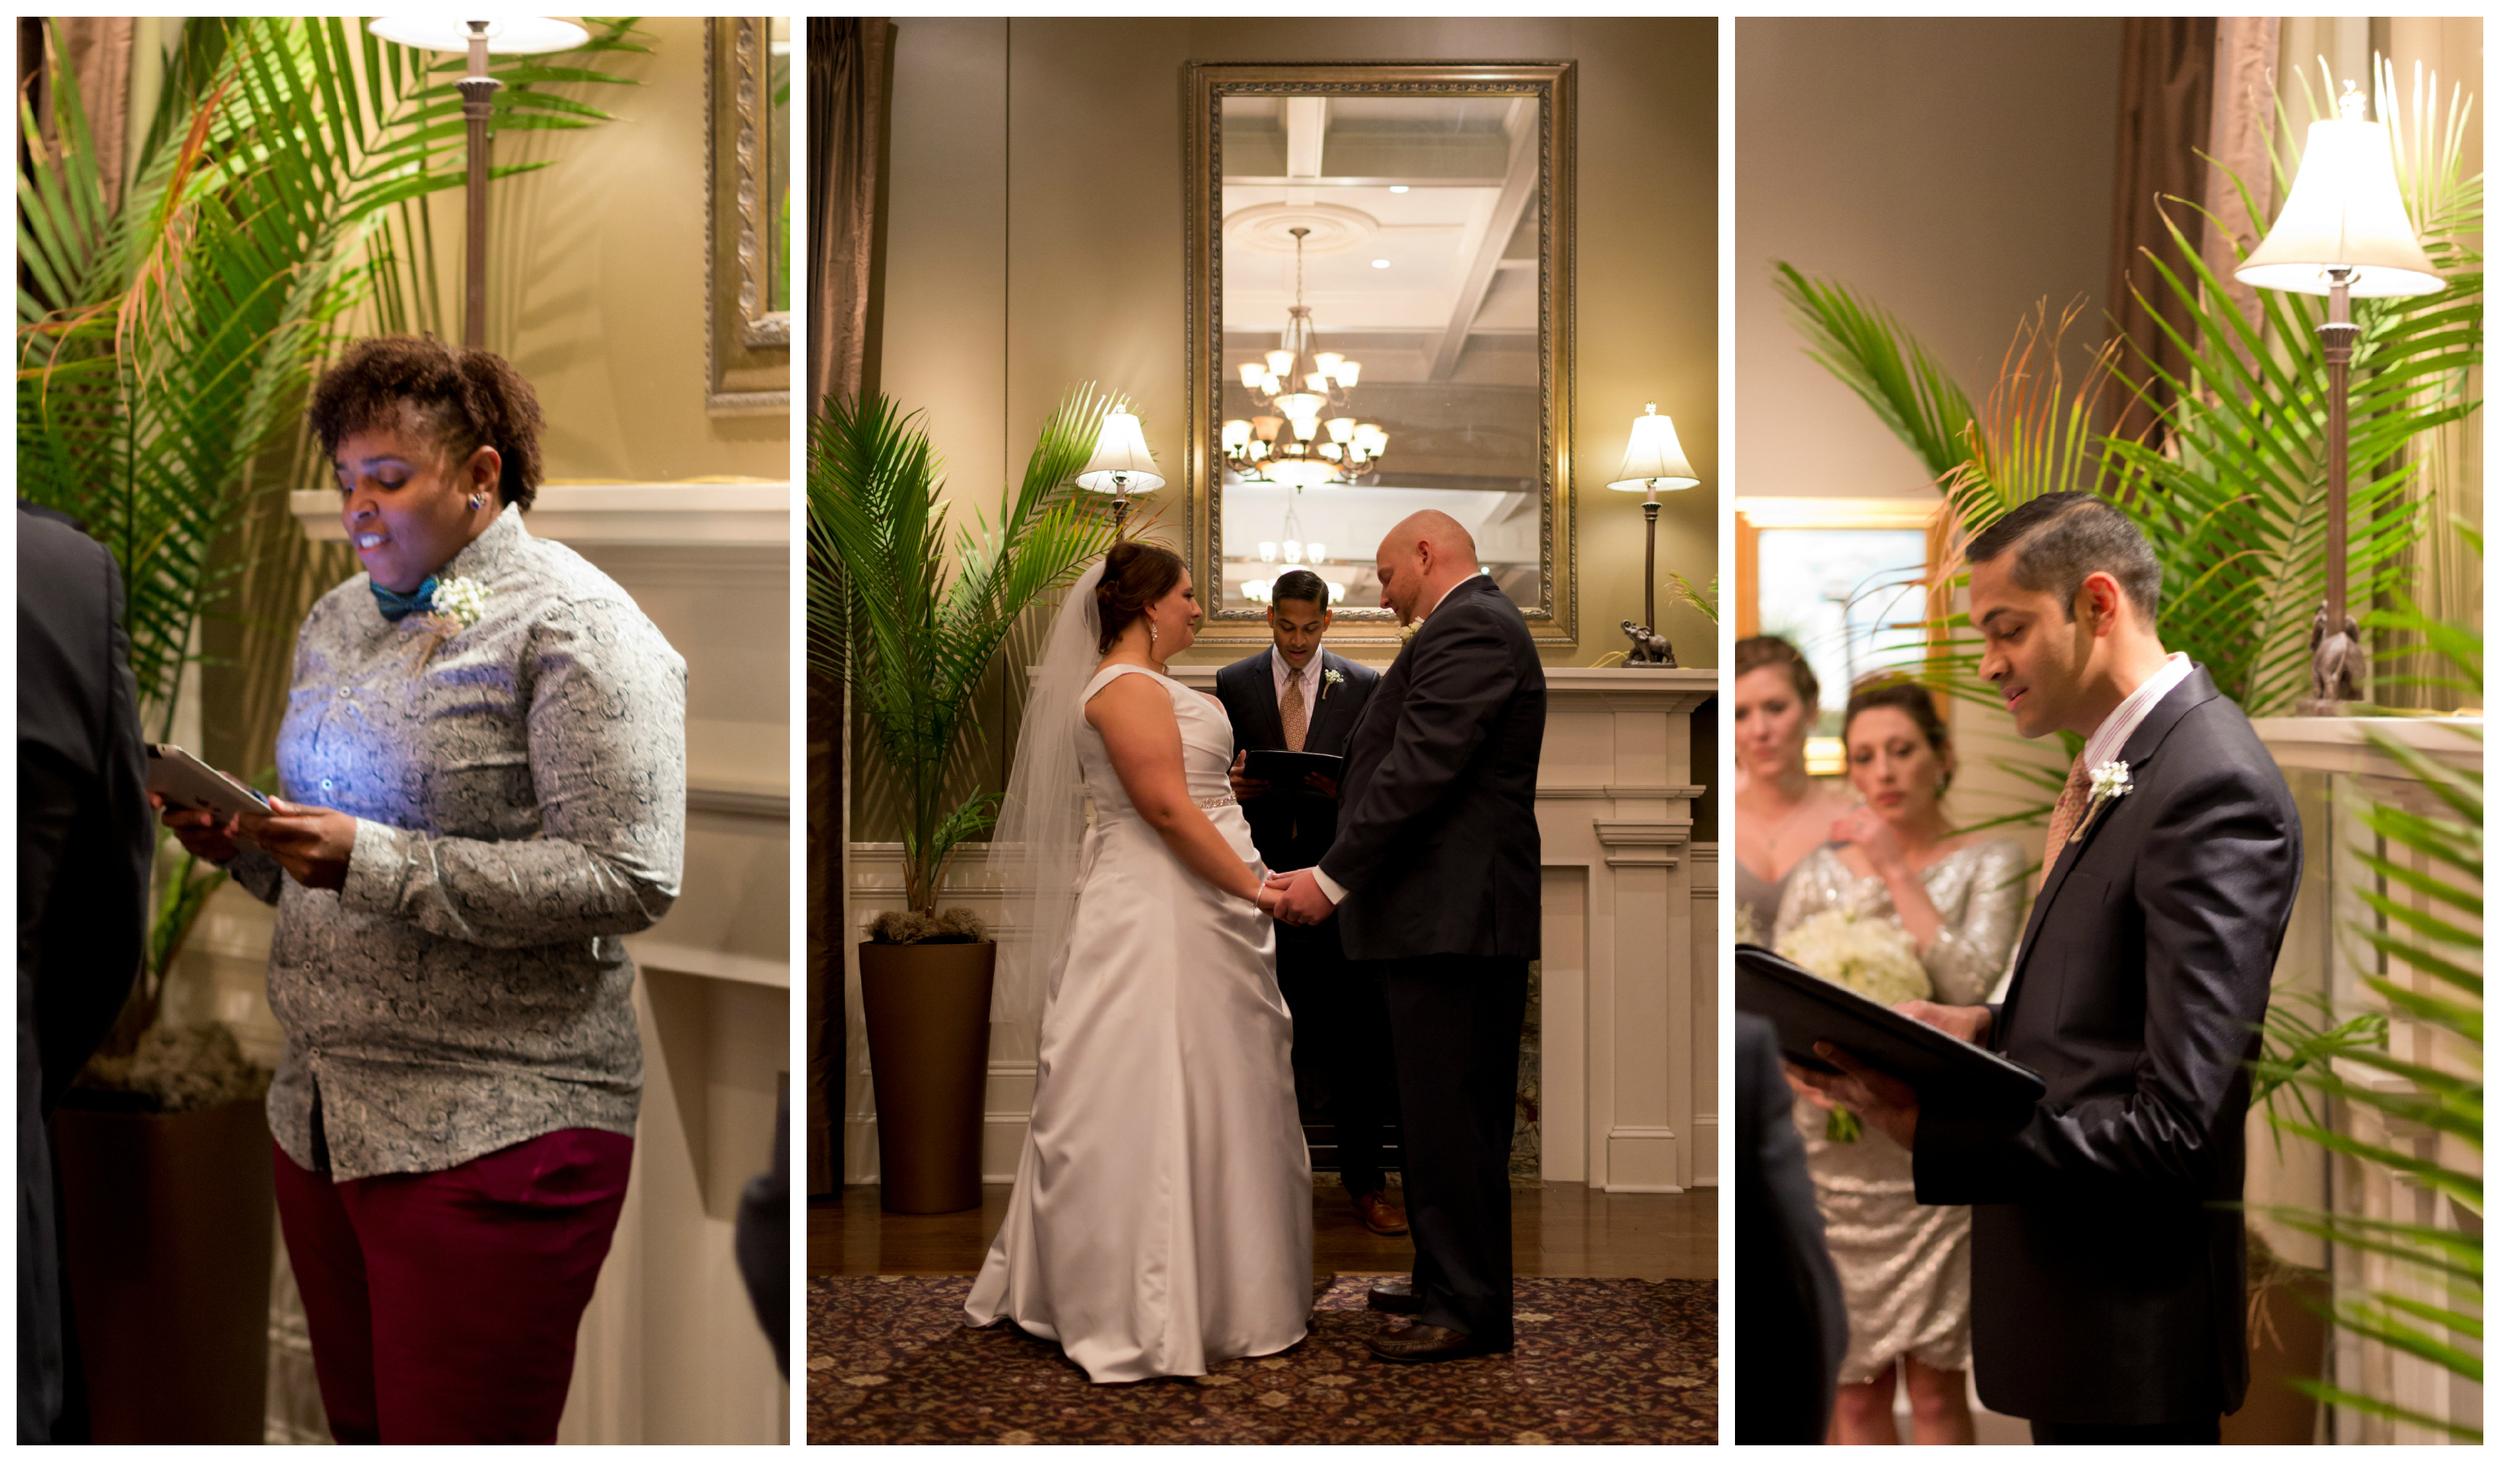 wedding ceremony at Biloxi Visitors Center